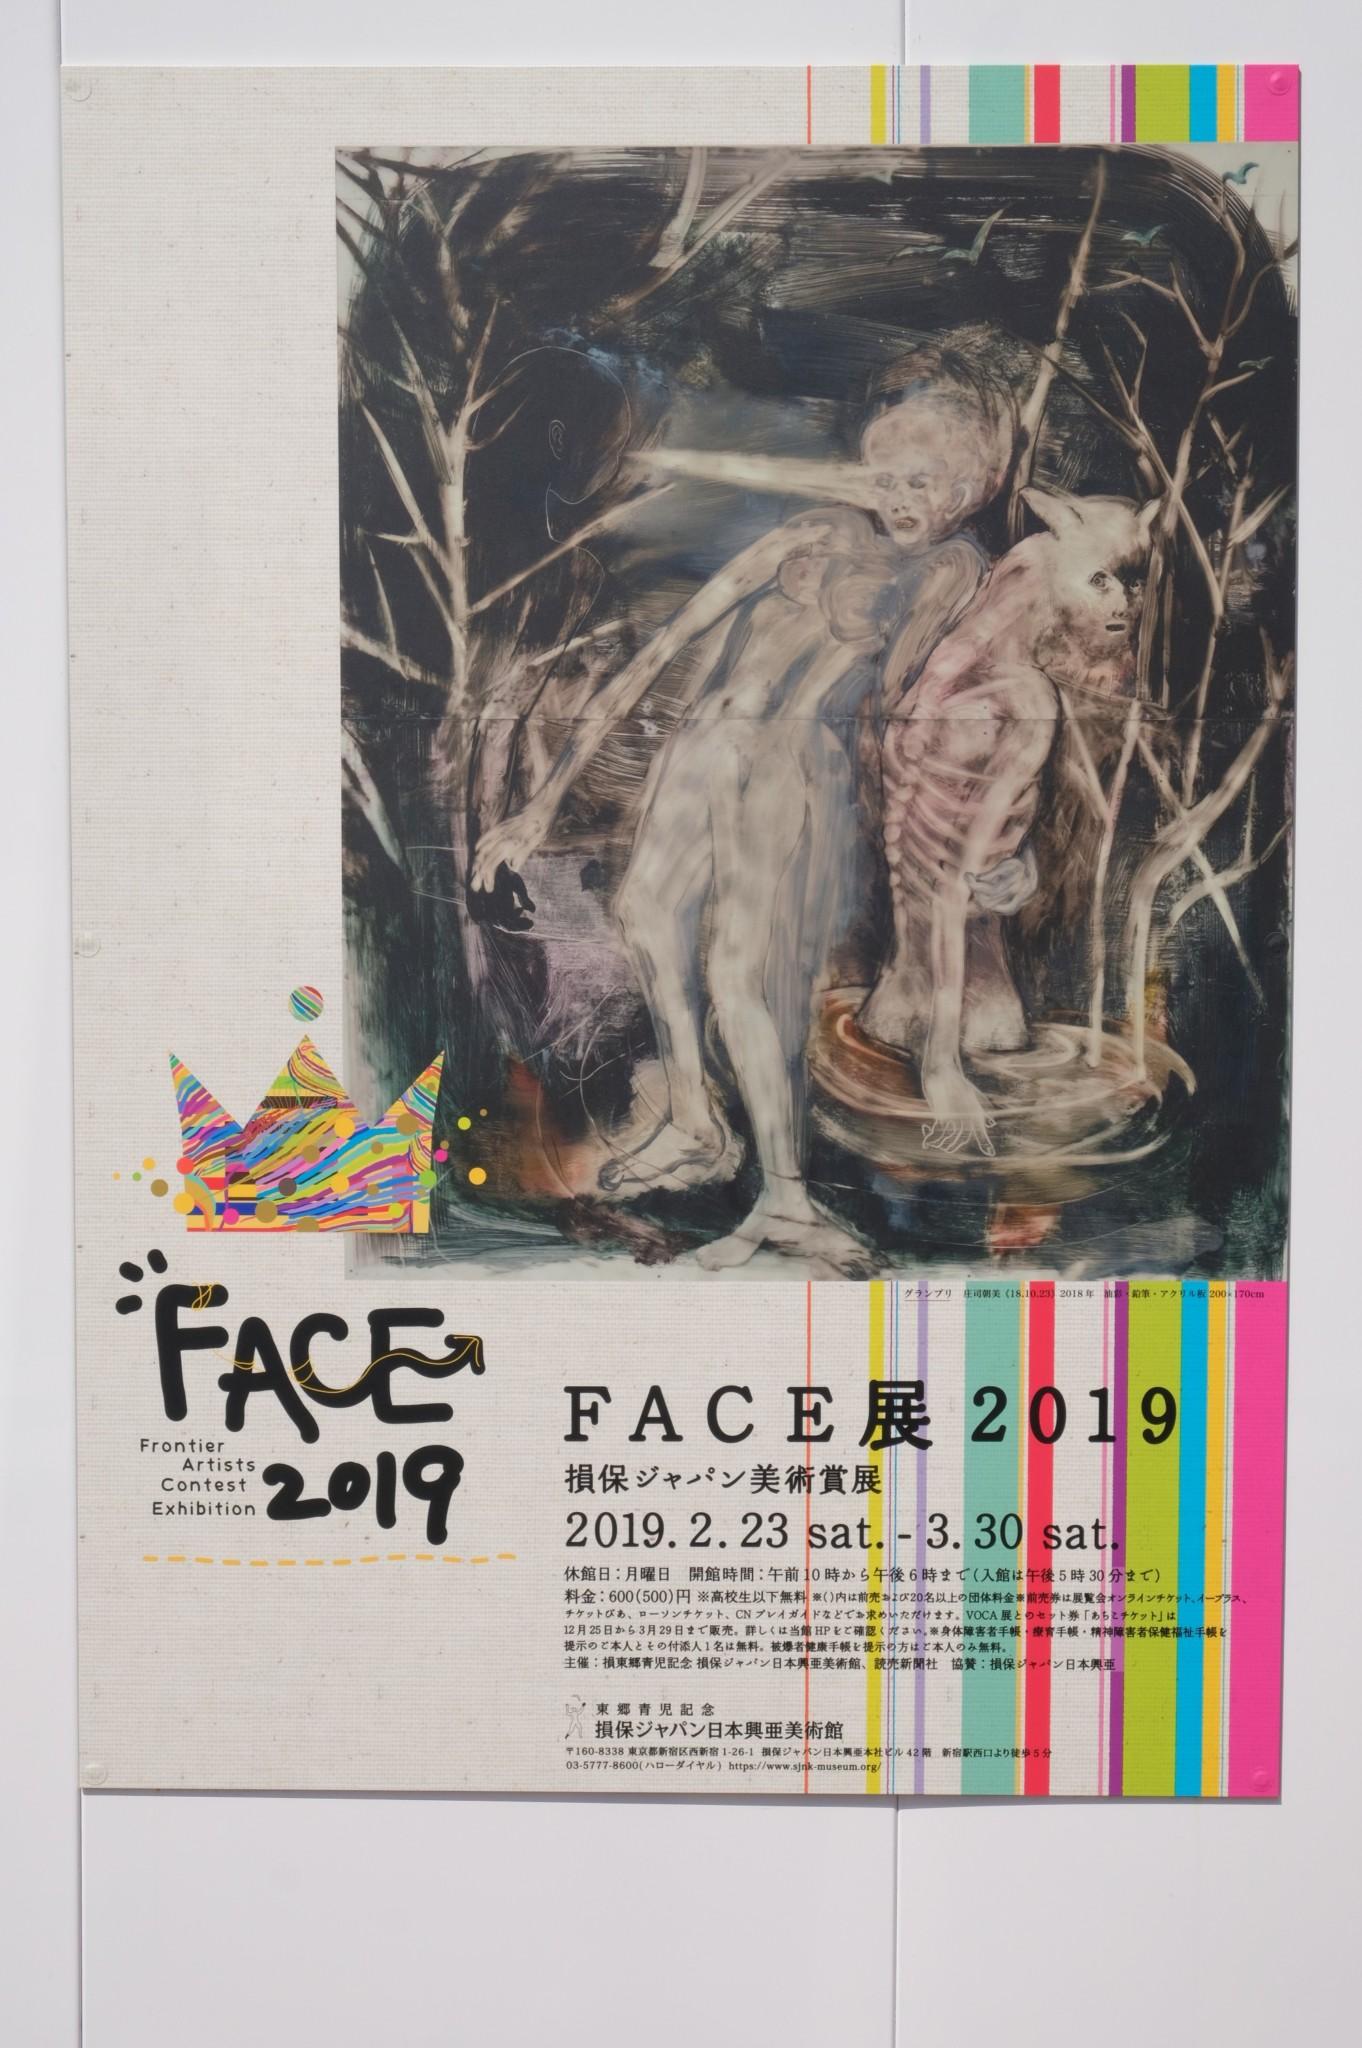 FACE展 2019 損保ジャパン日本興亜美術賞展@東郷青児記念 損保ジャパン日本興亜美術館